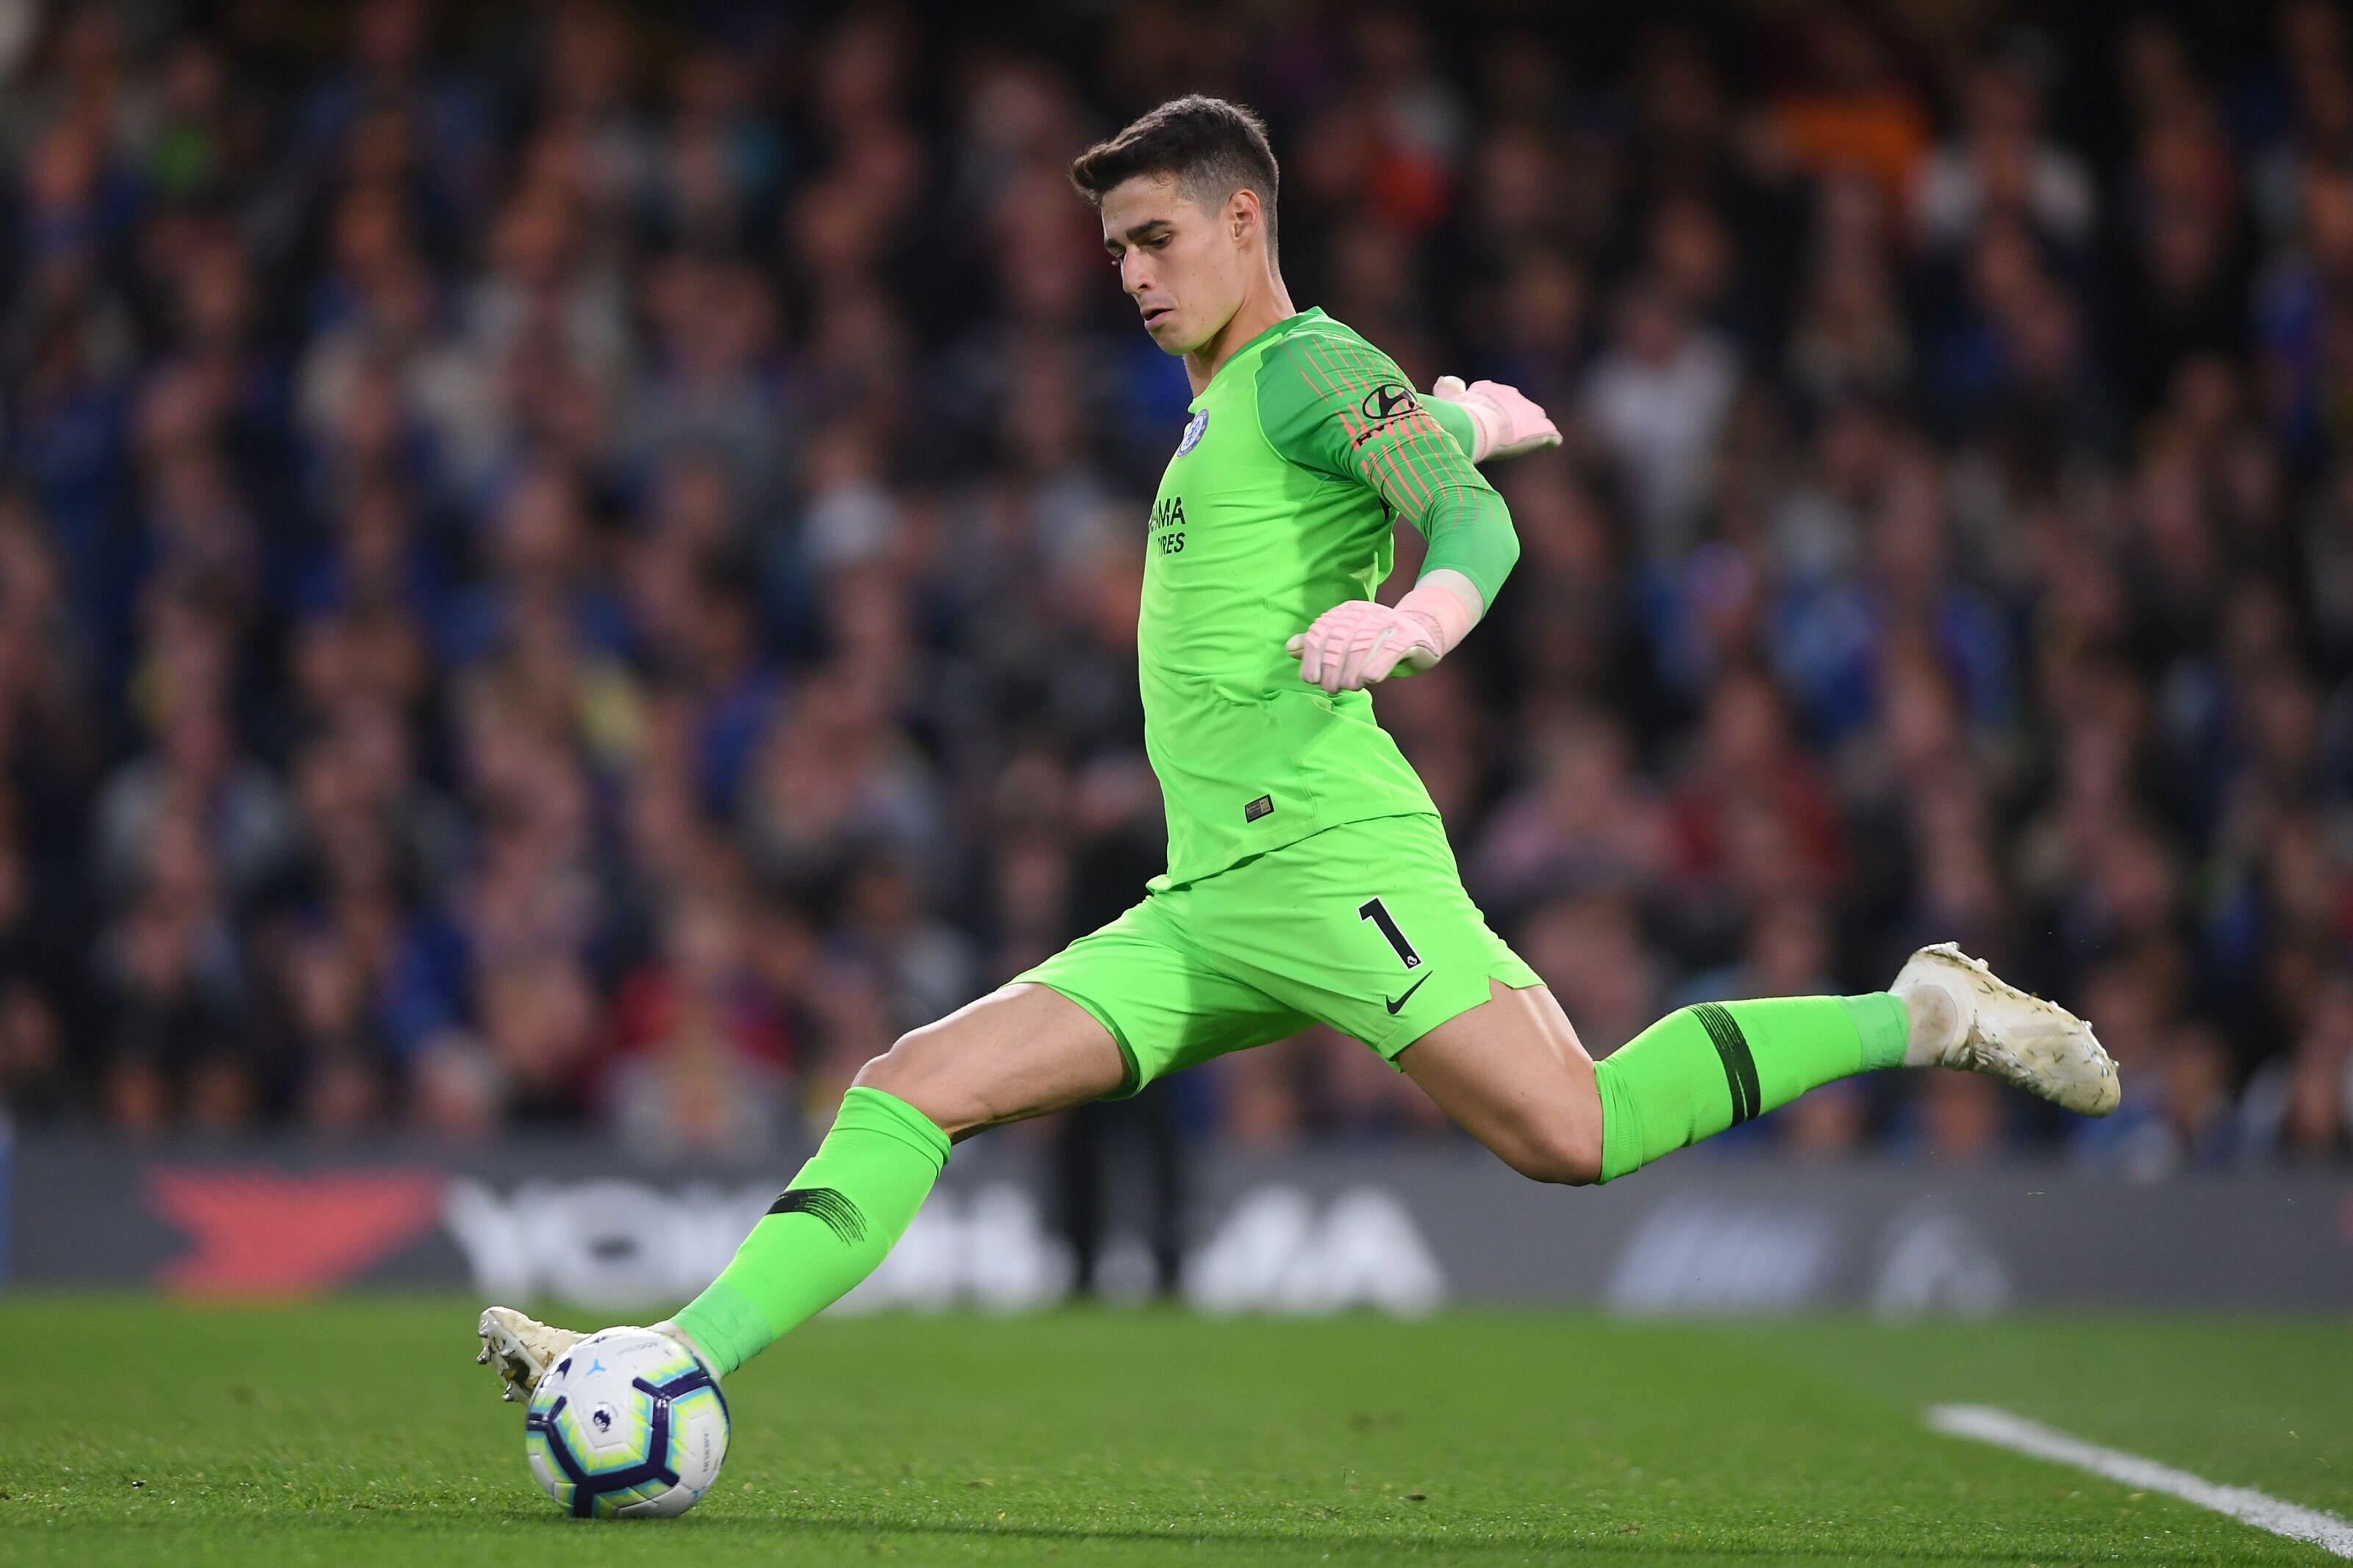 Chelsea: Three notes for your Saturday – Goal kicks, Eto'o and Batshuayi